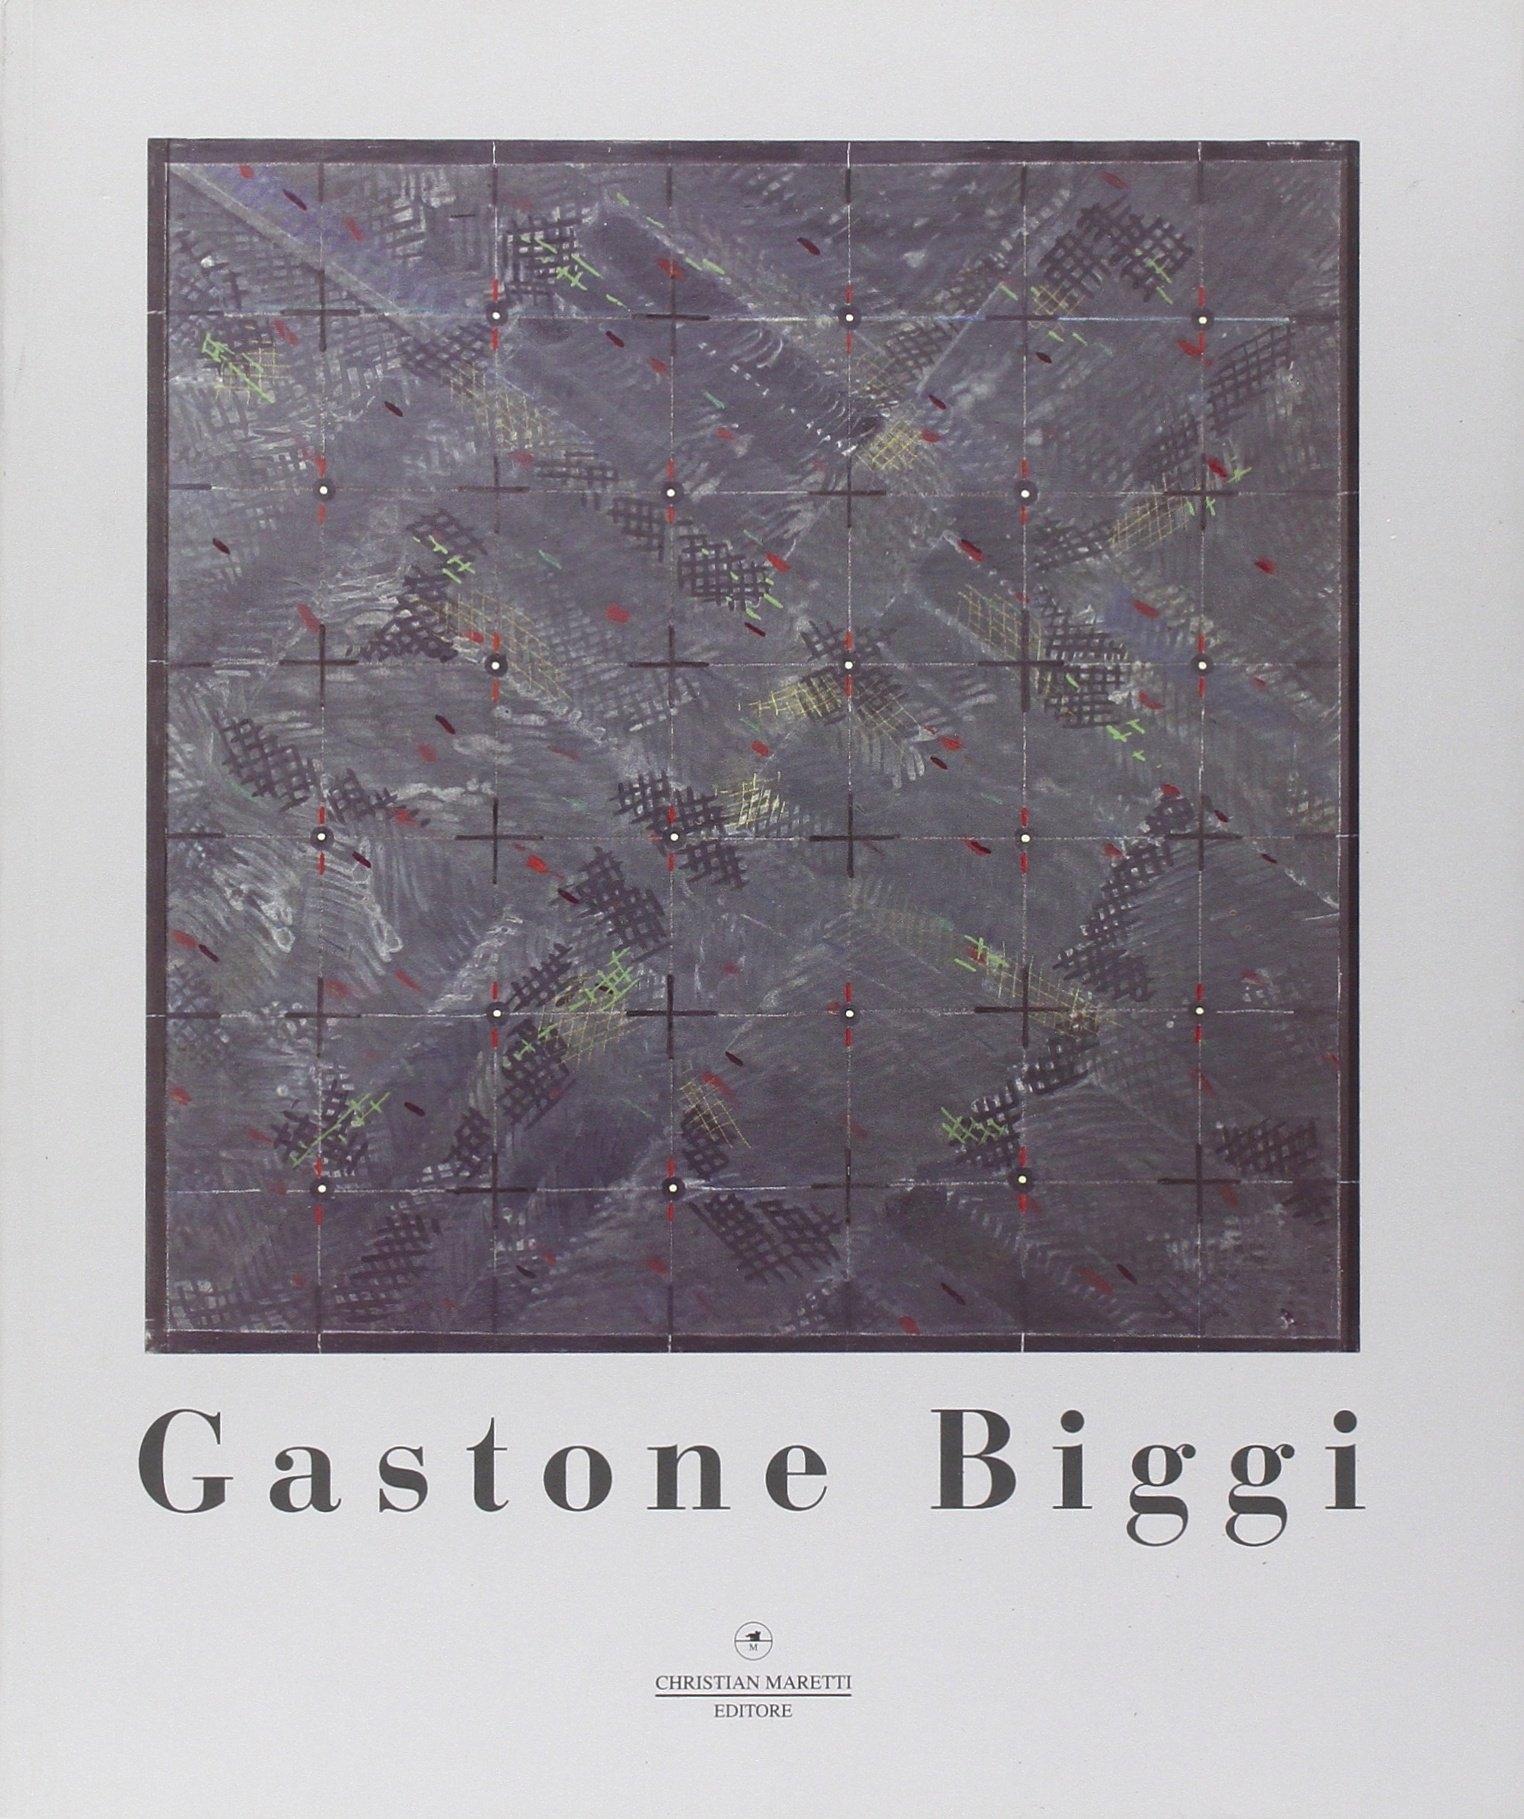 Gastone Biggi